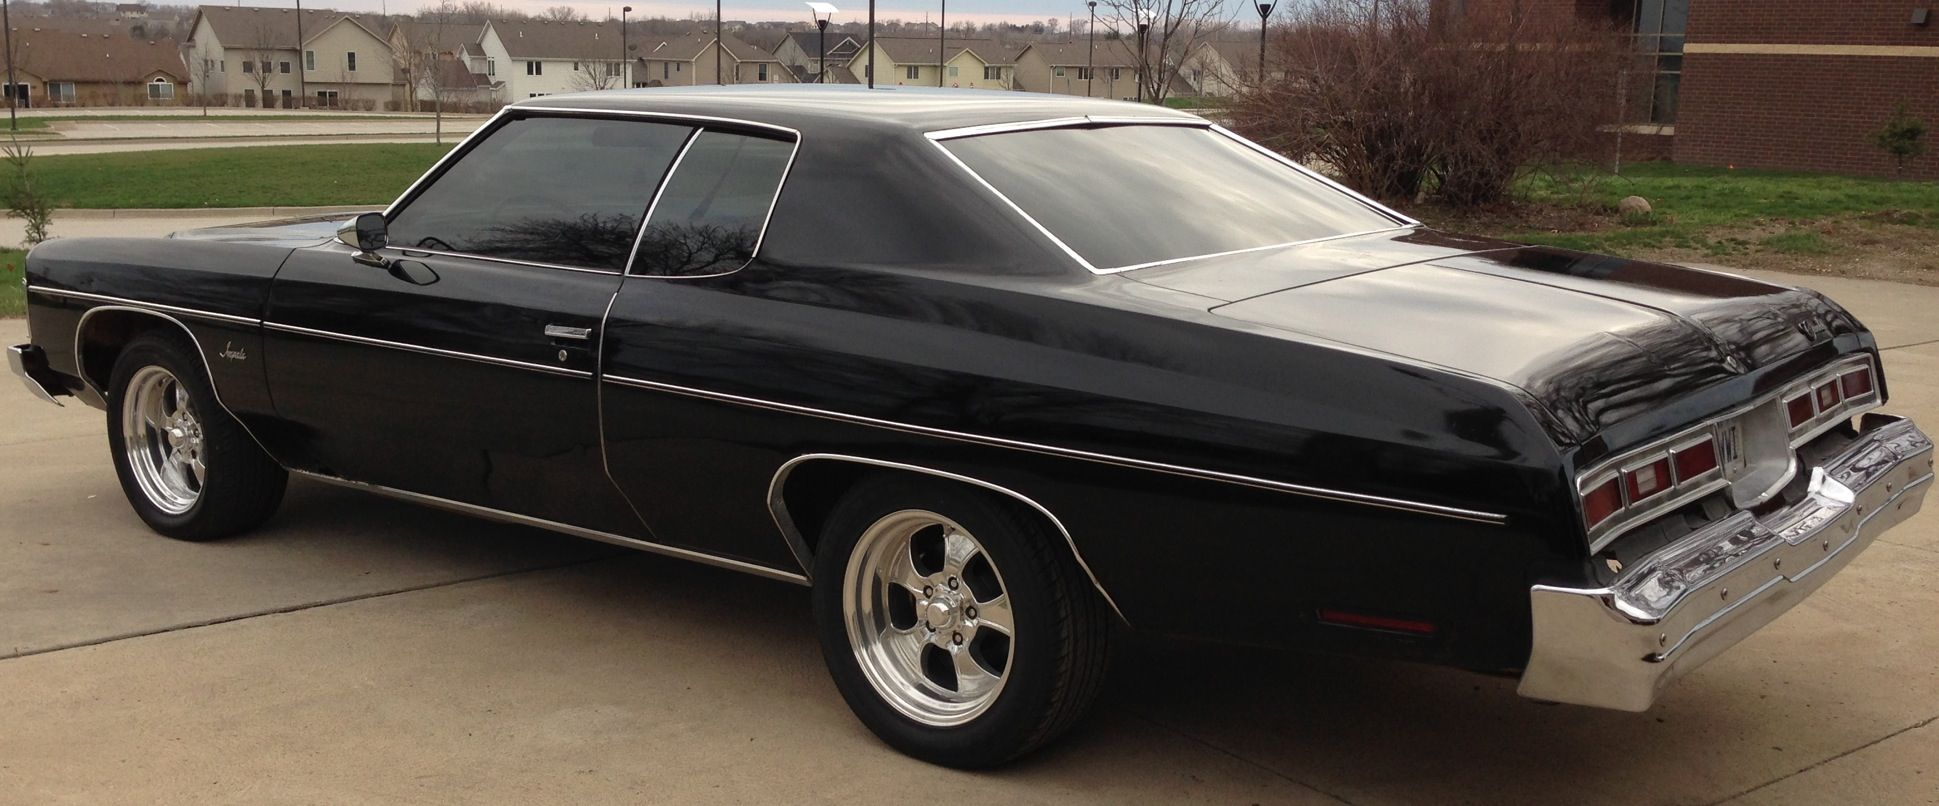 hight resolution of 1974 impala sport coupe 400 engine